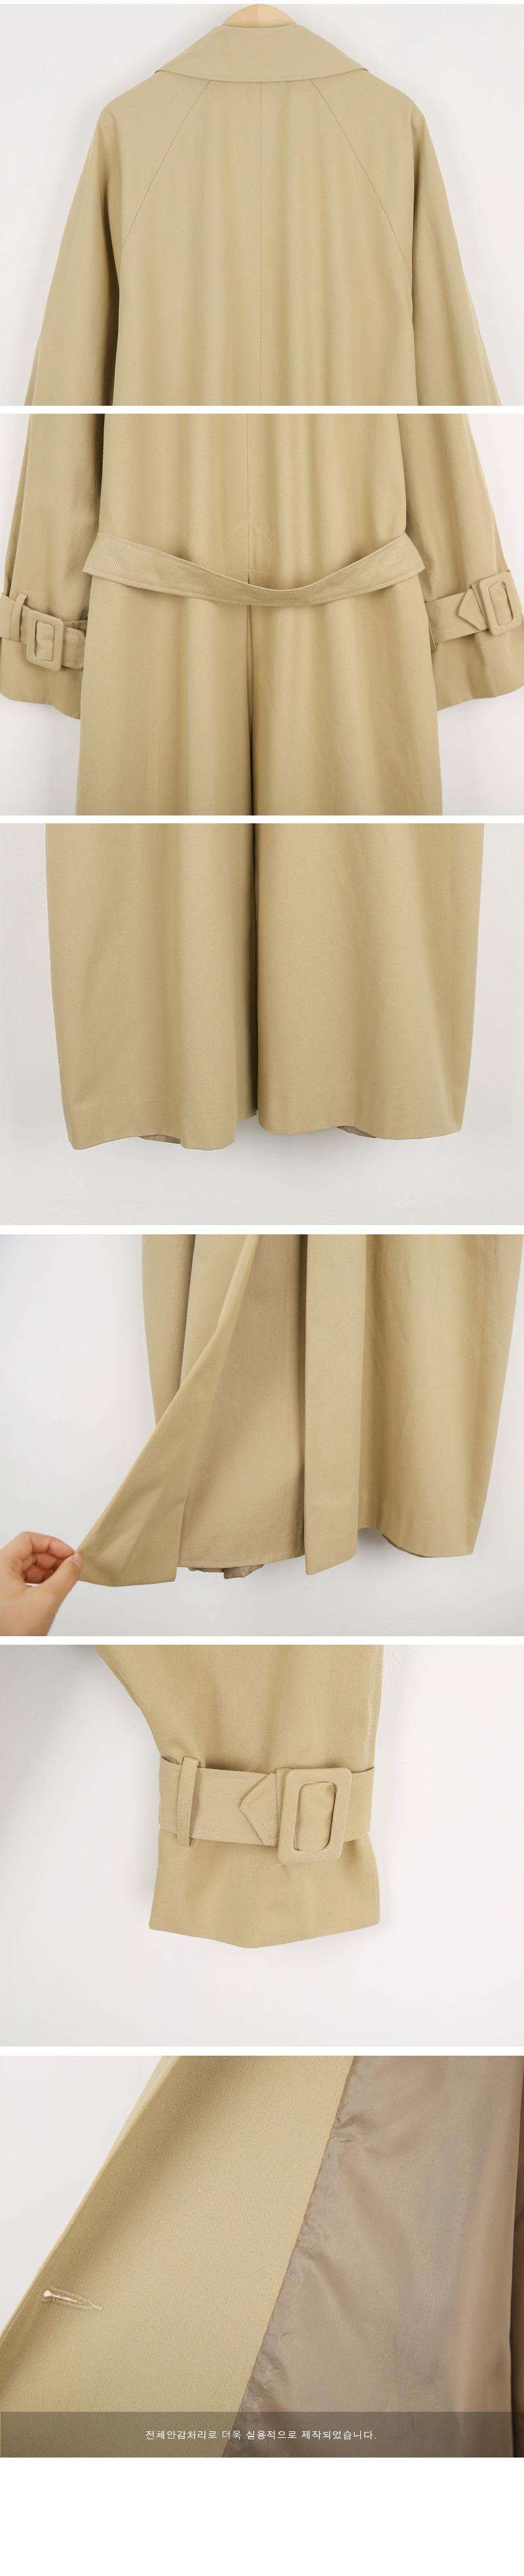 Oxford single trench coat